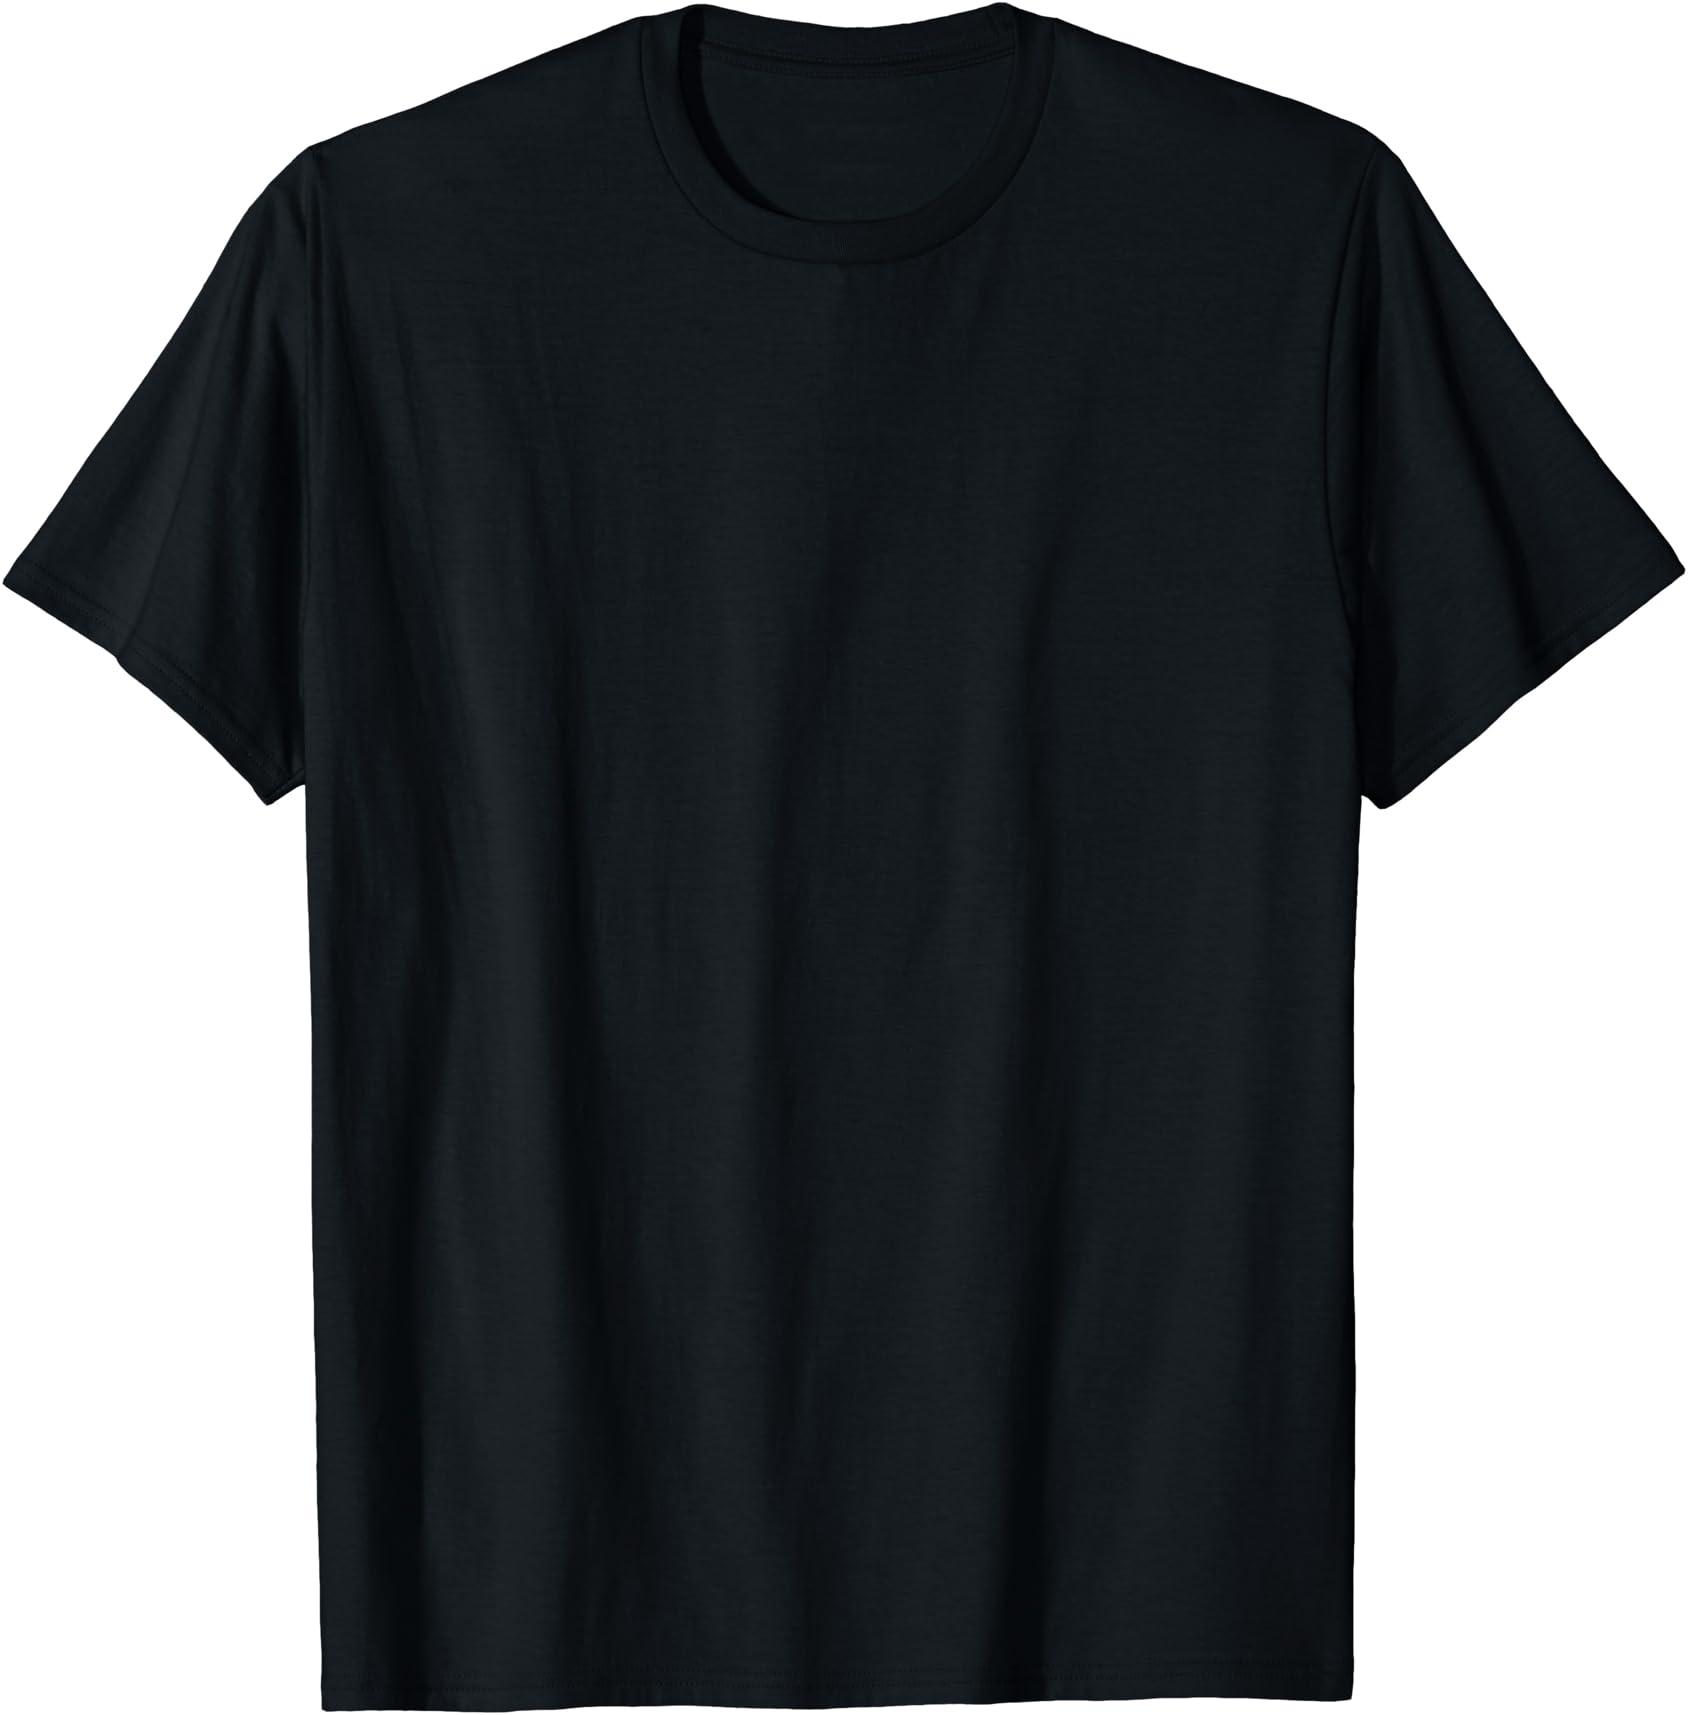 Santa Clara City Shamrock Cotton T-Shirt